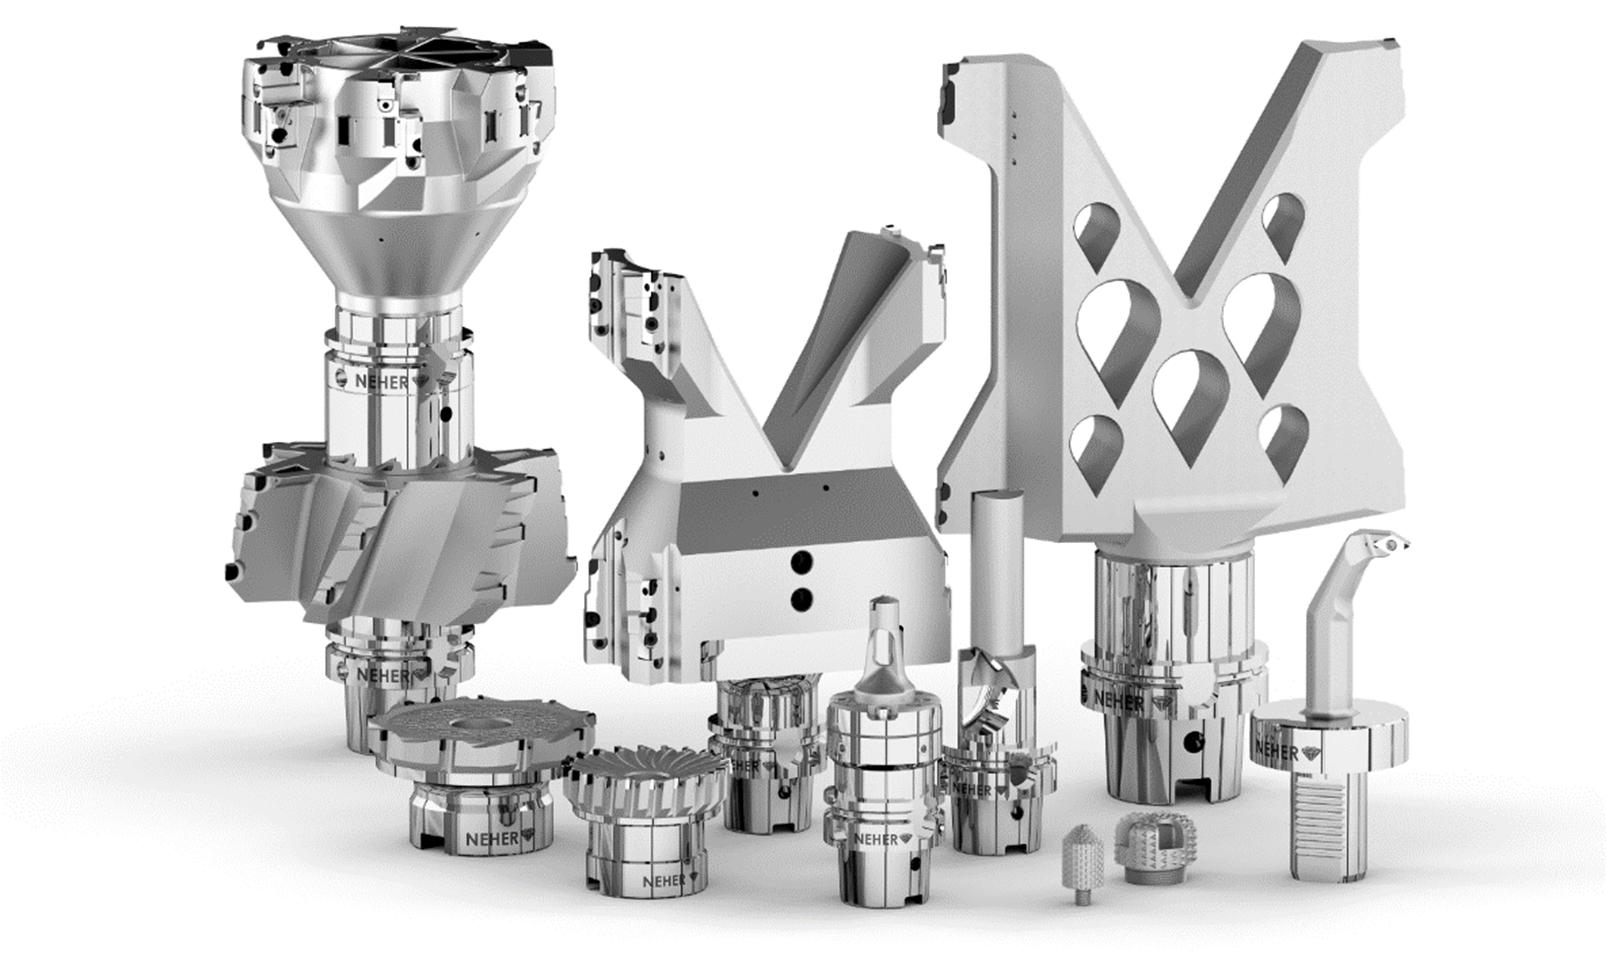 3D Printed Tool Bodies